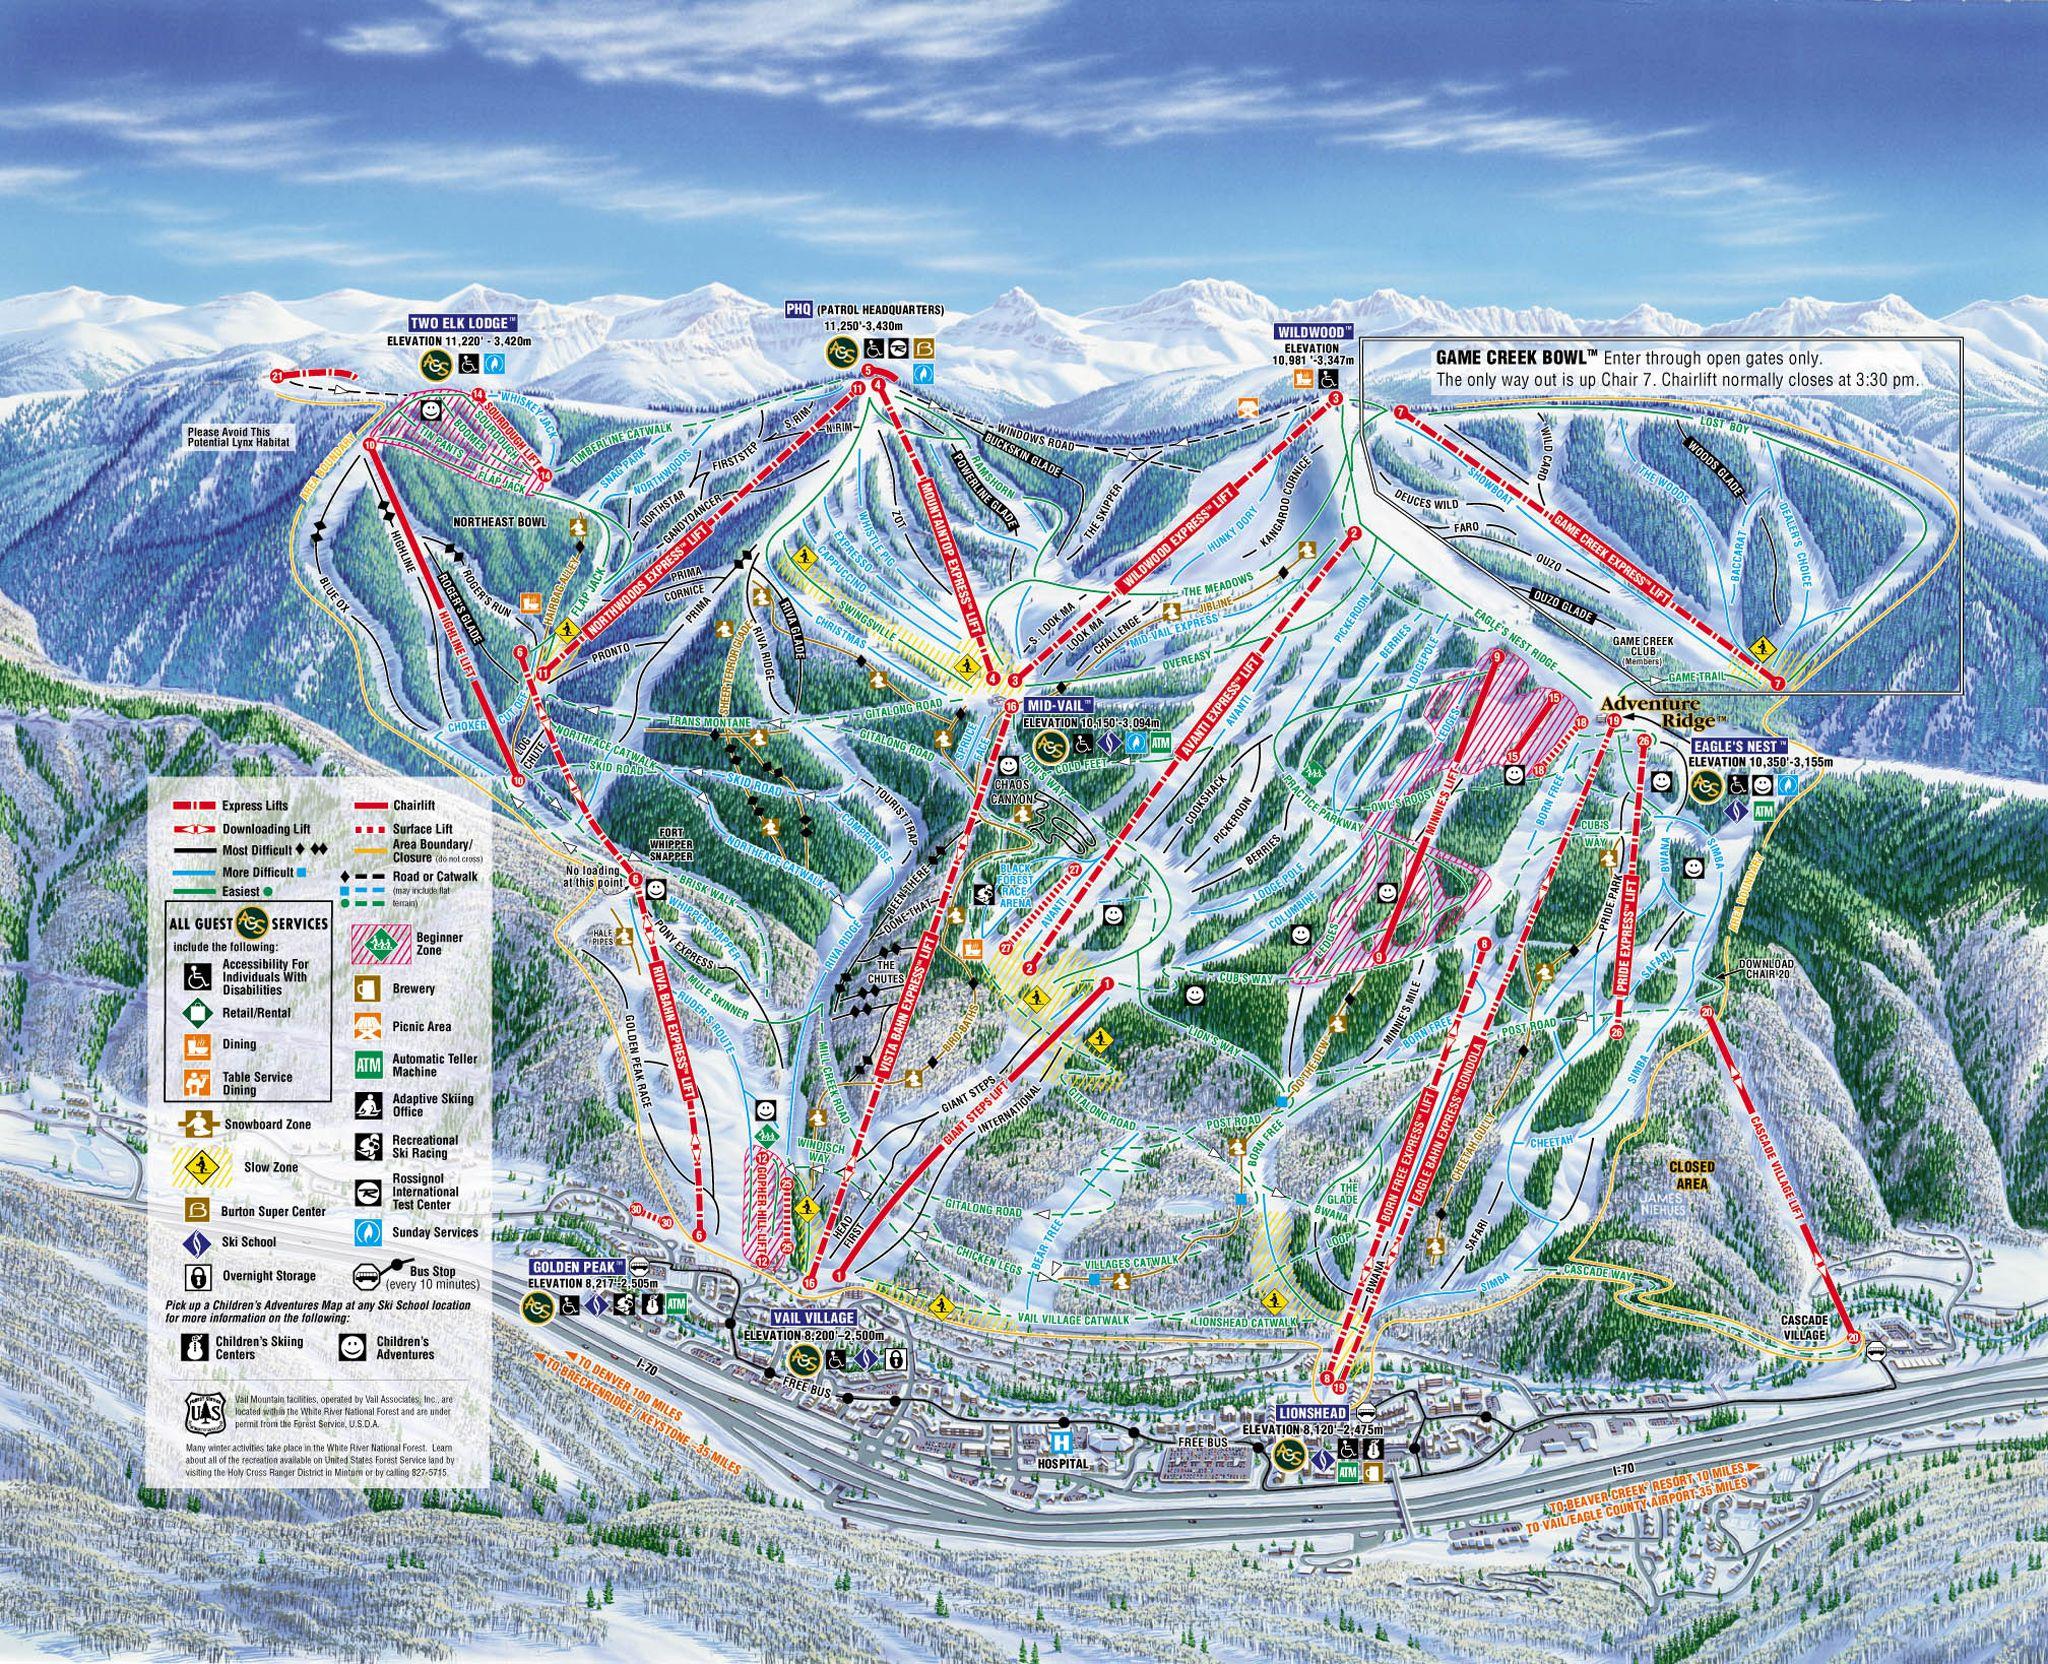 Best Kitchen Gallery: Vail Trail Map Wanna Go Back Already Love These Pinterest of Vail Ski Resort on rachelxblog.com